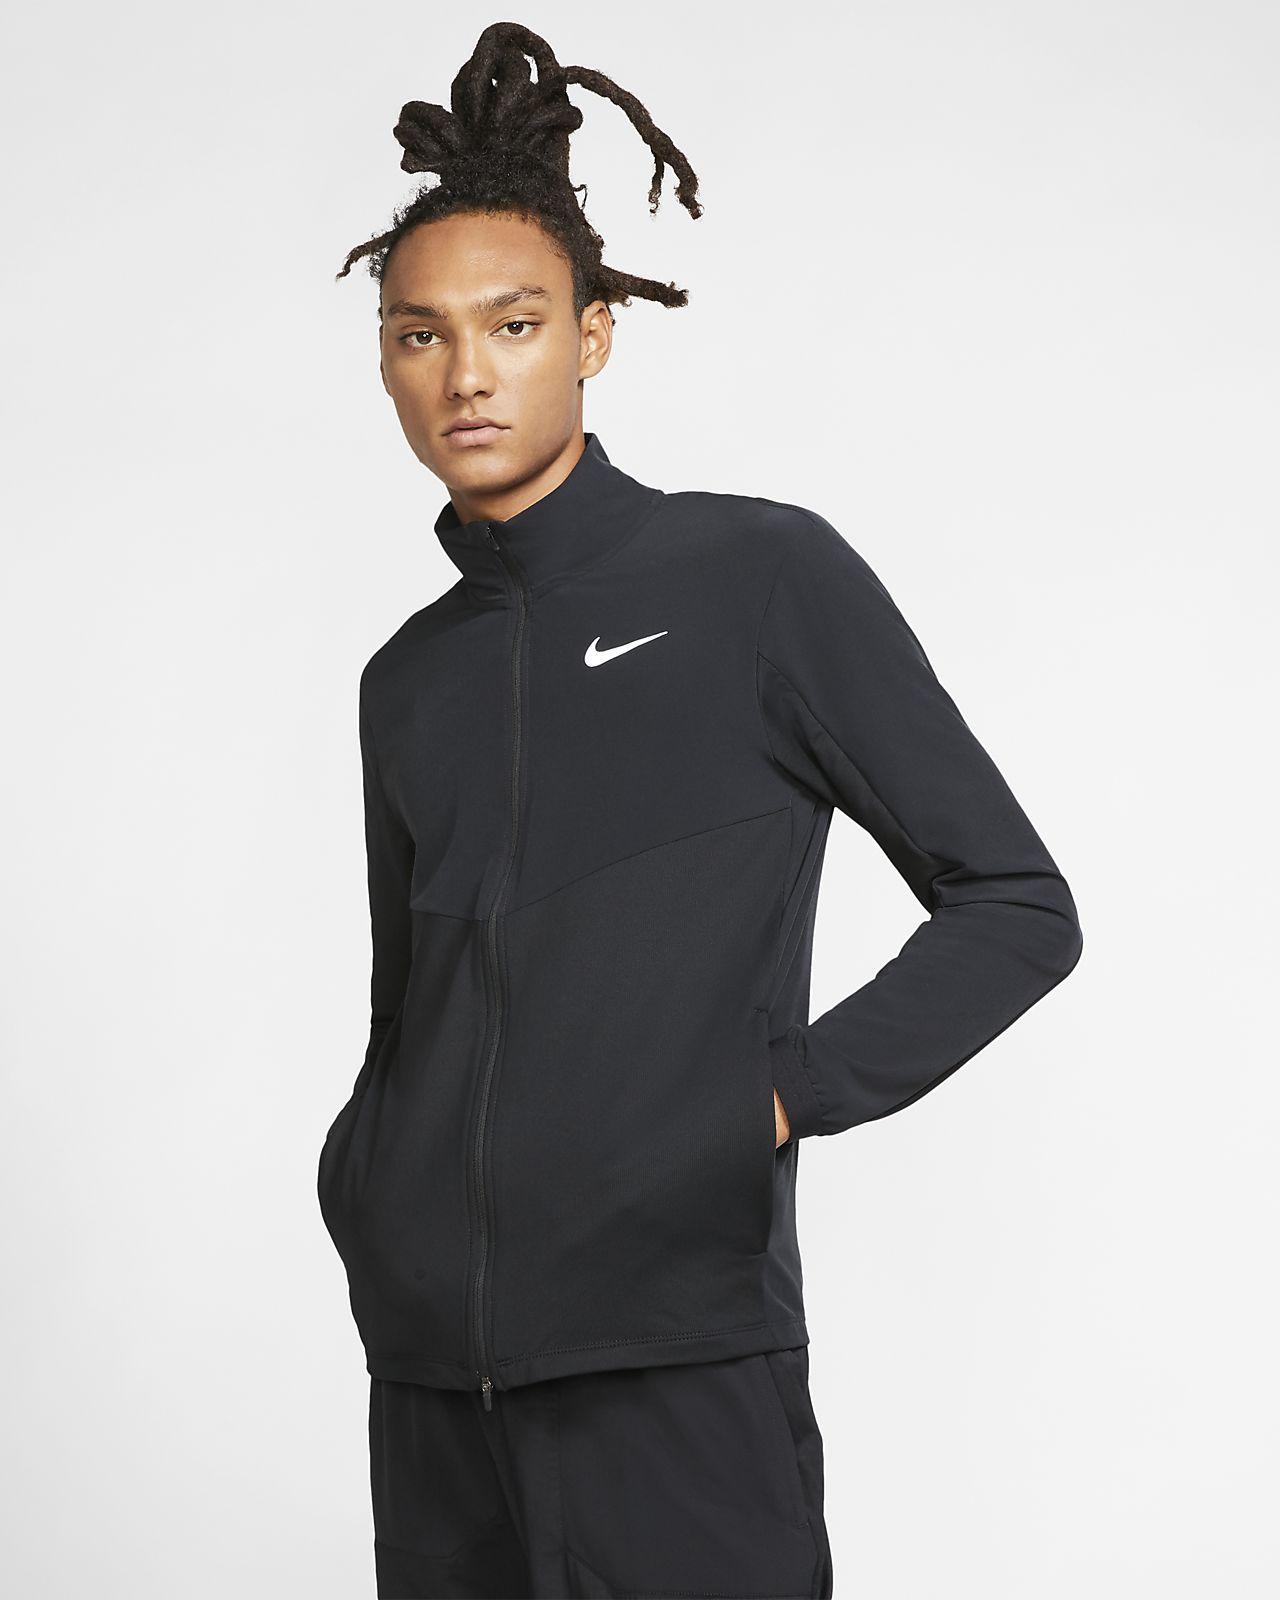 Nike Element 男子全长拉链开襟跑步夹克